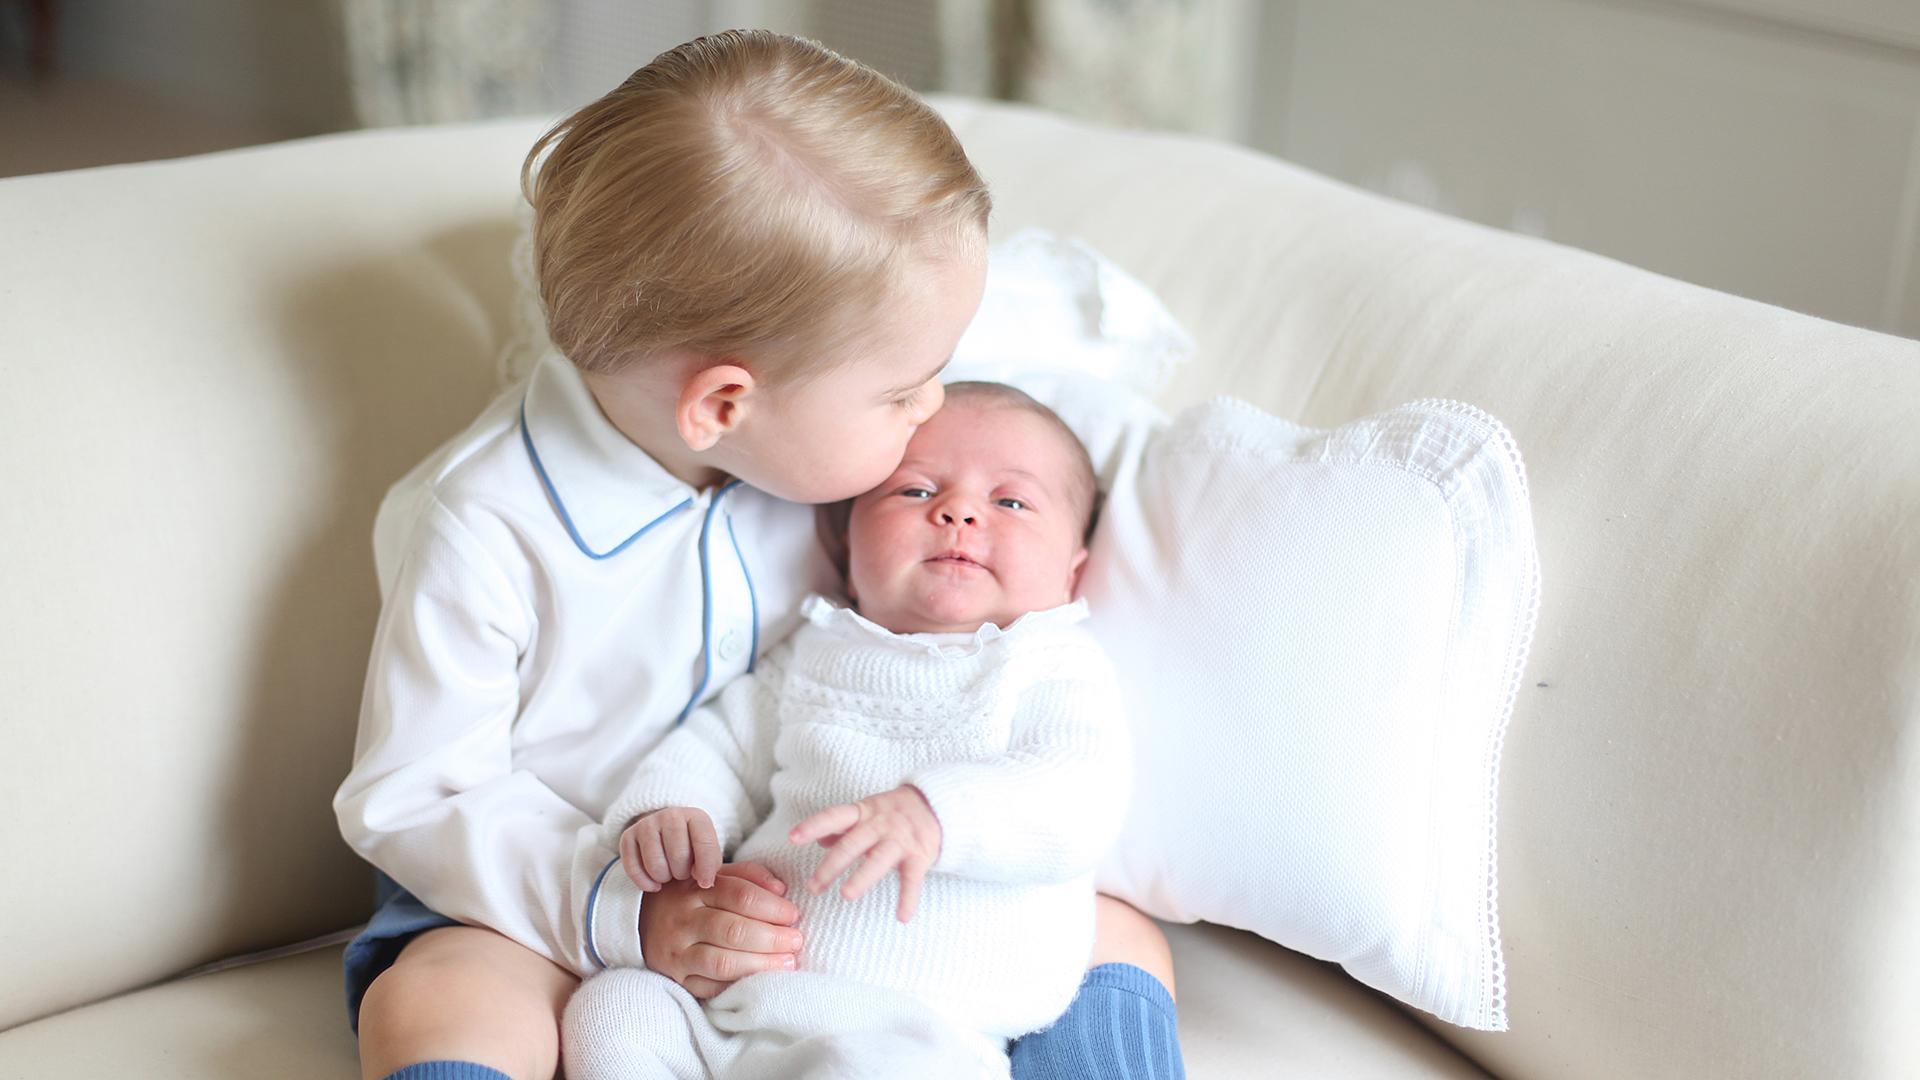 Royal Siblings Images Prince George Kissing Princess Charlotte HD Wallpaper And Background Photos